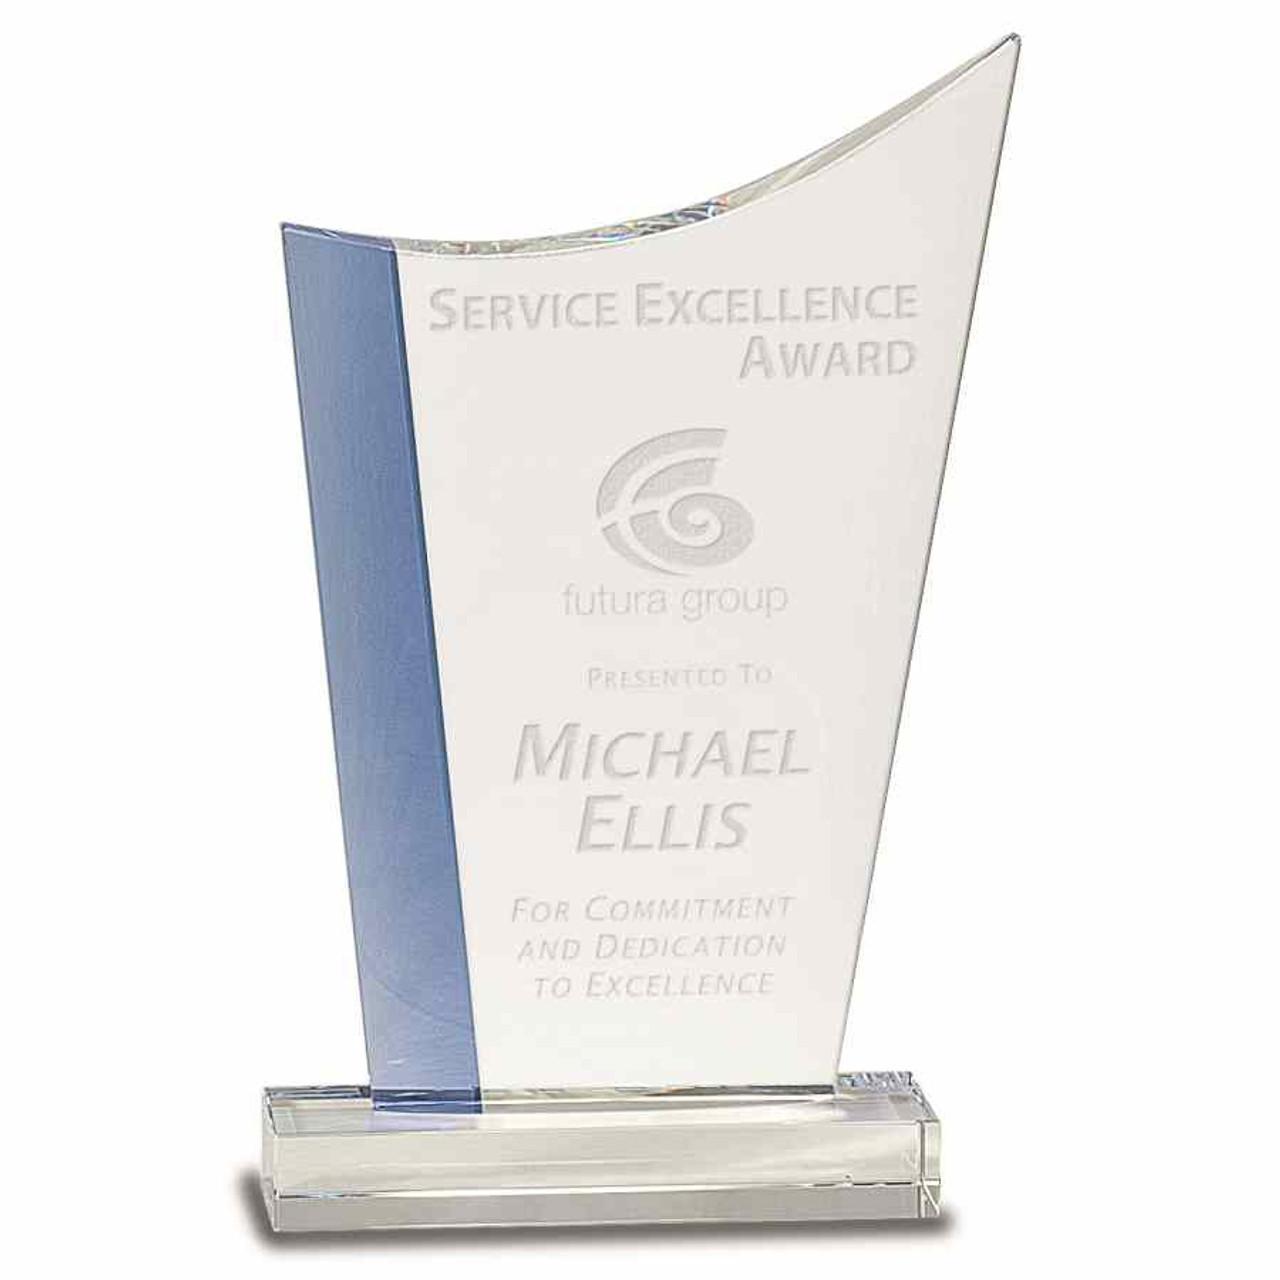 Cool Blue Series Blue Edge Crest Award